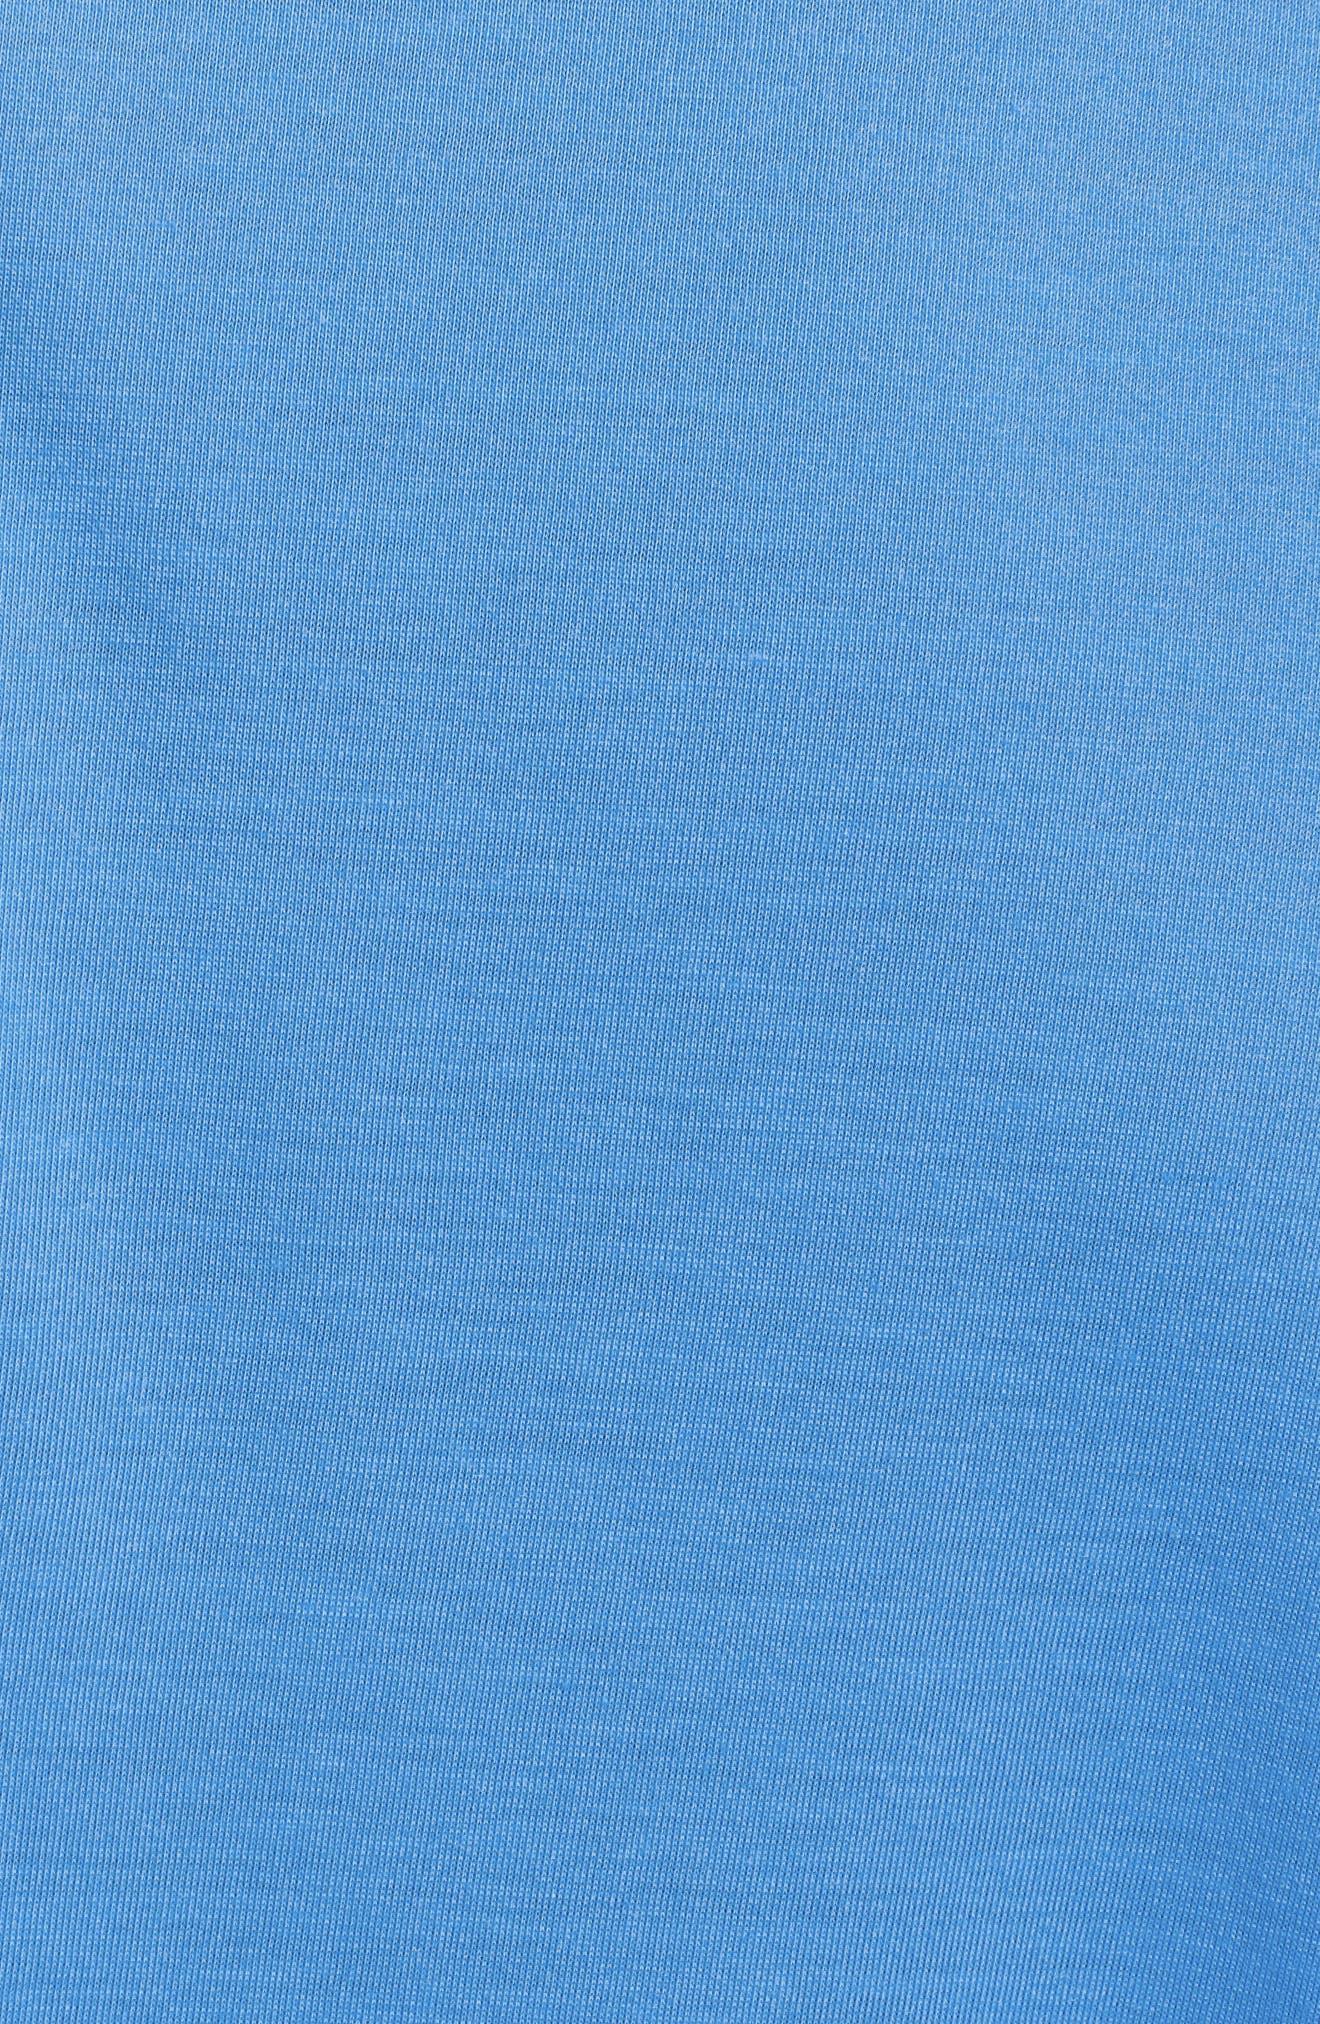 Alternate Image 5  - Under Armour Threadborne Quarter-Zip Performance Shirt